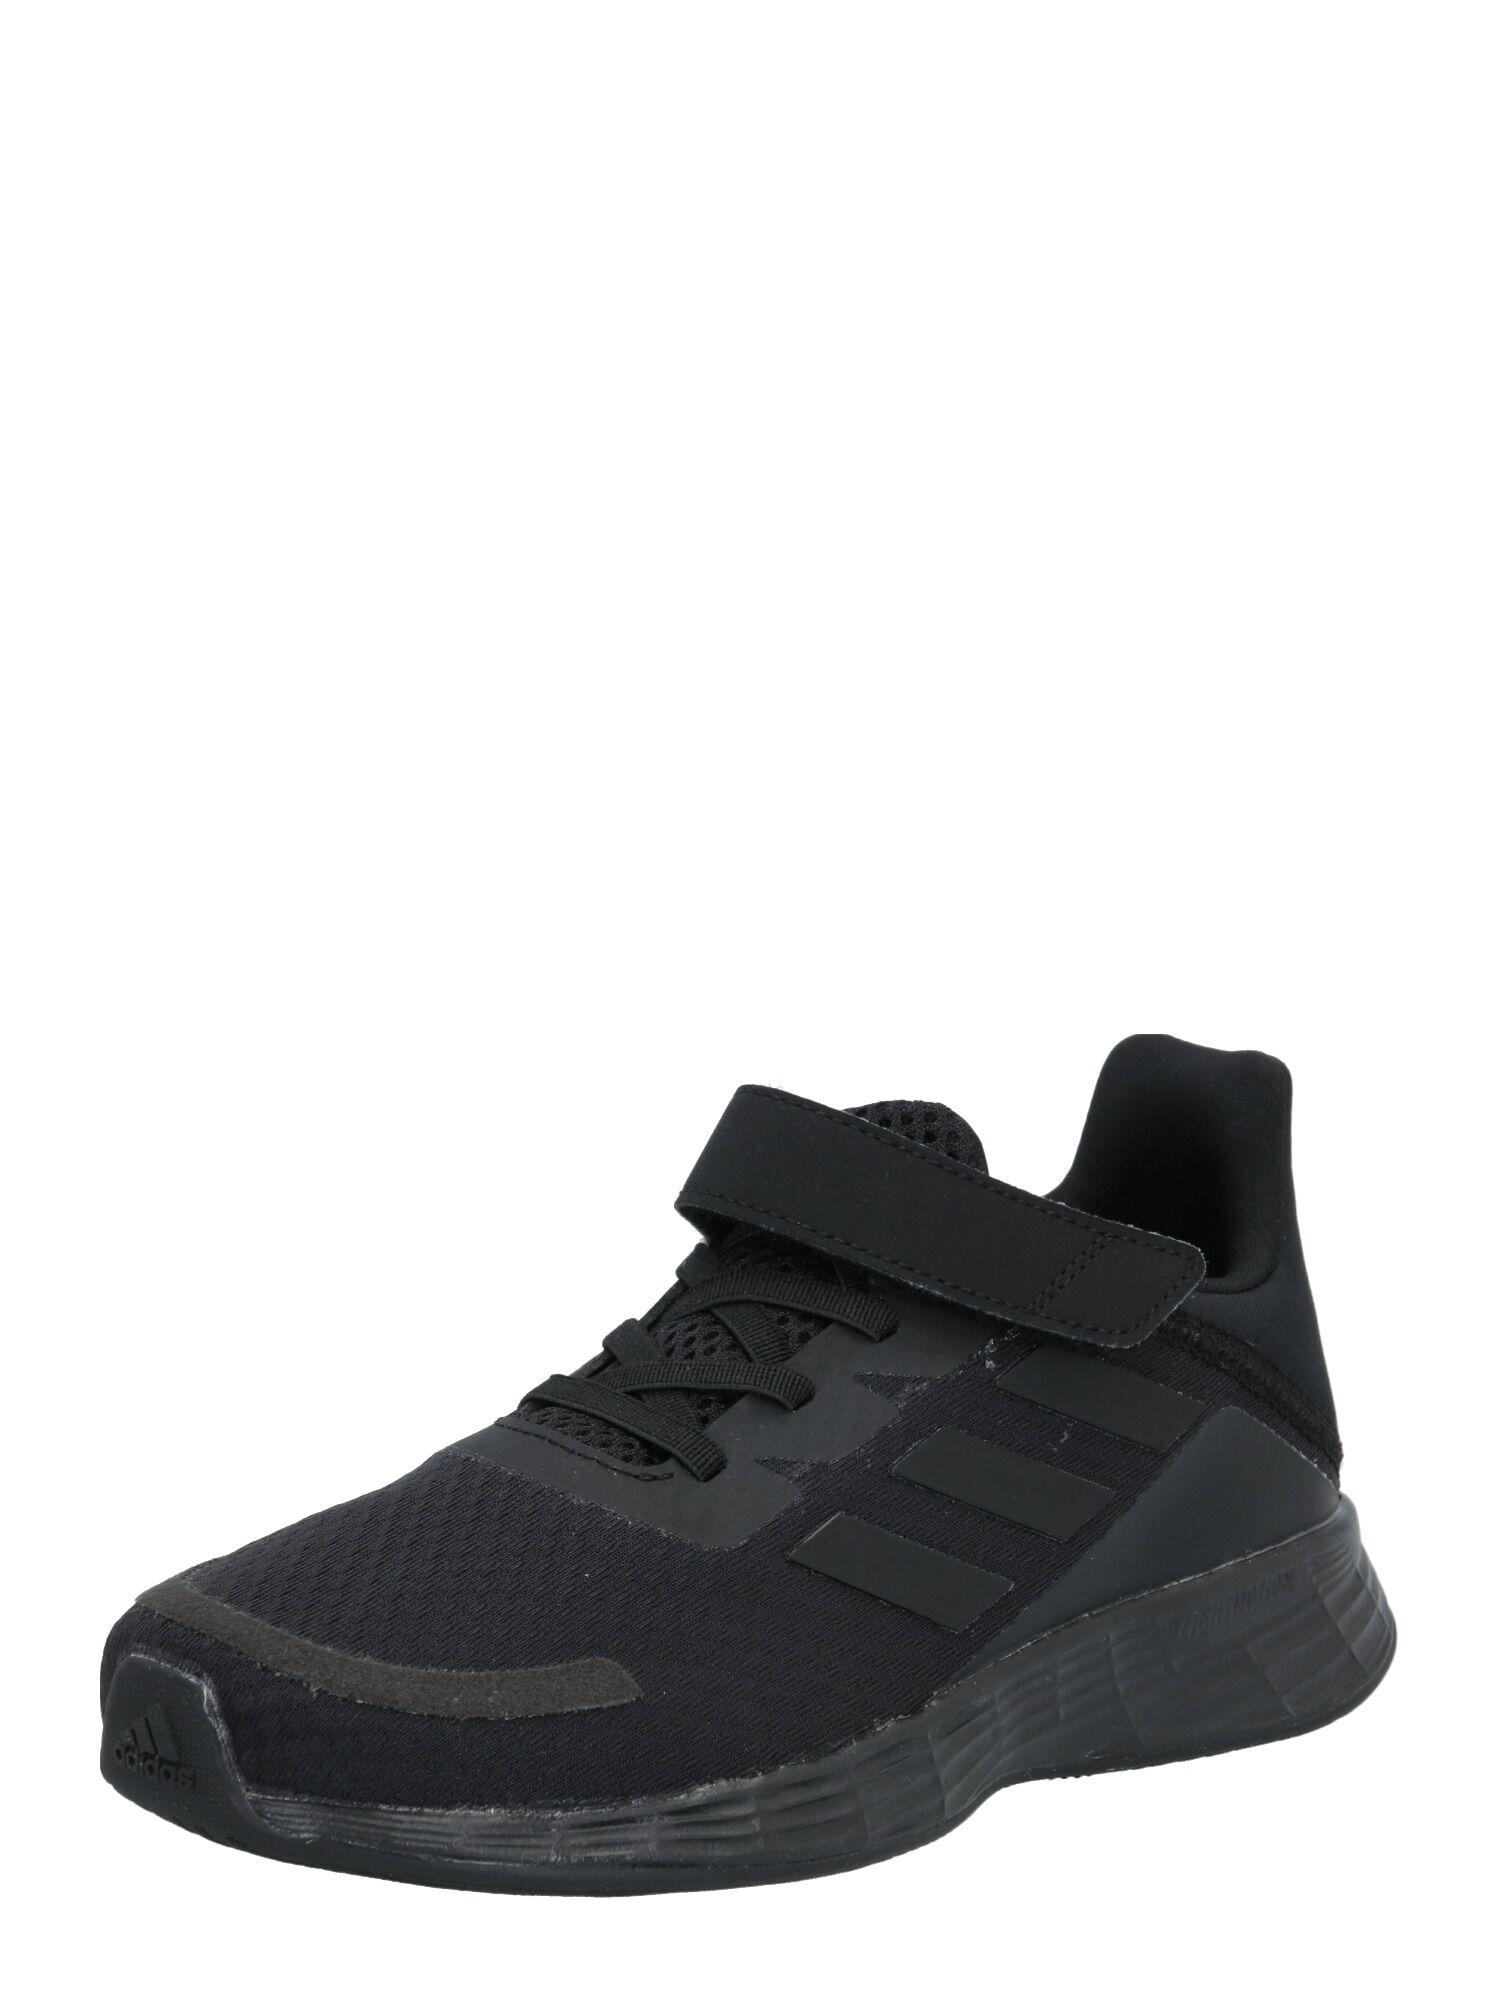 adidas performance scarpa sportiva 'duramo' nero